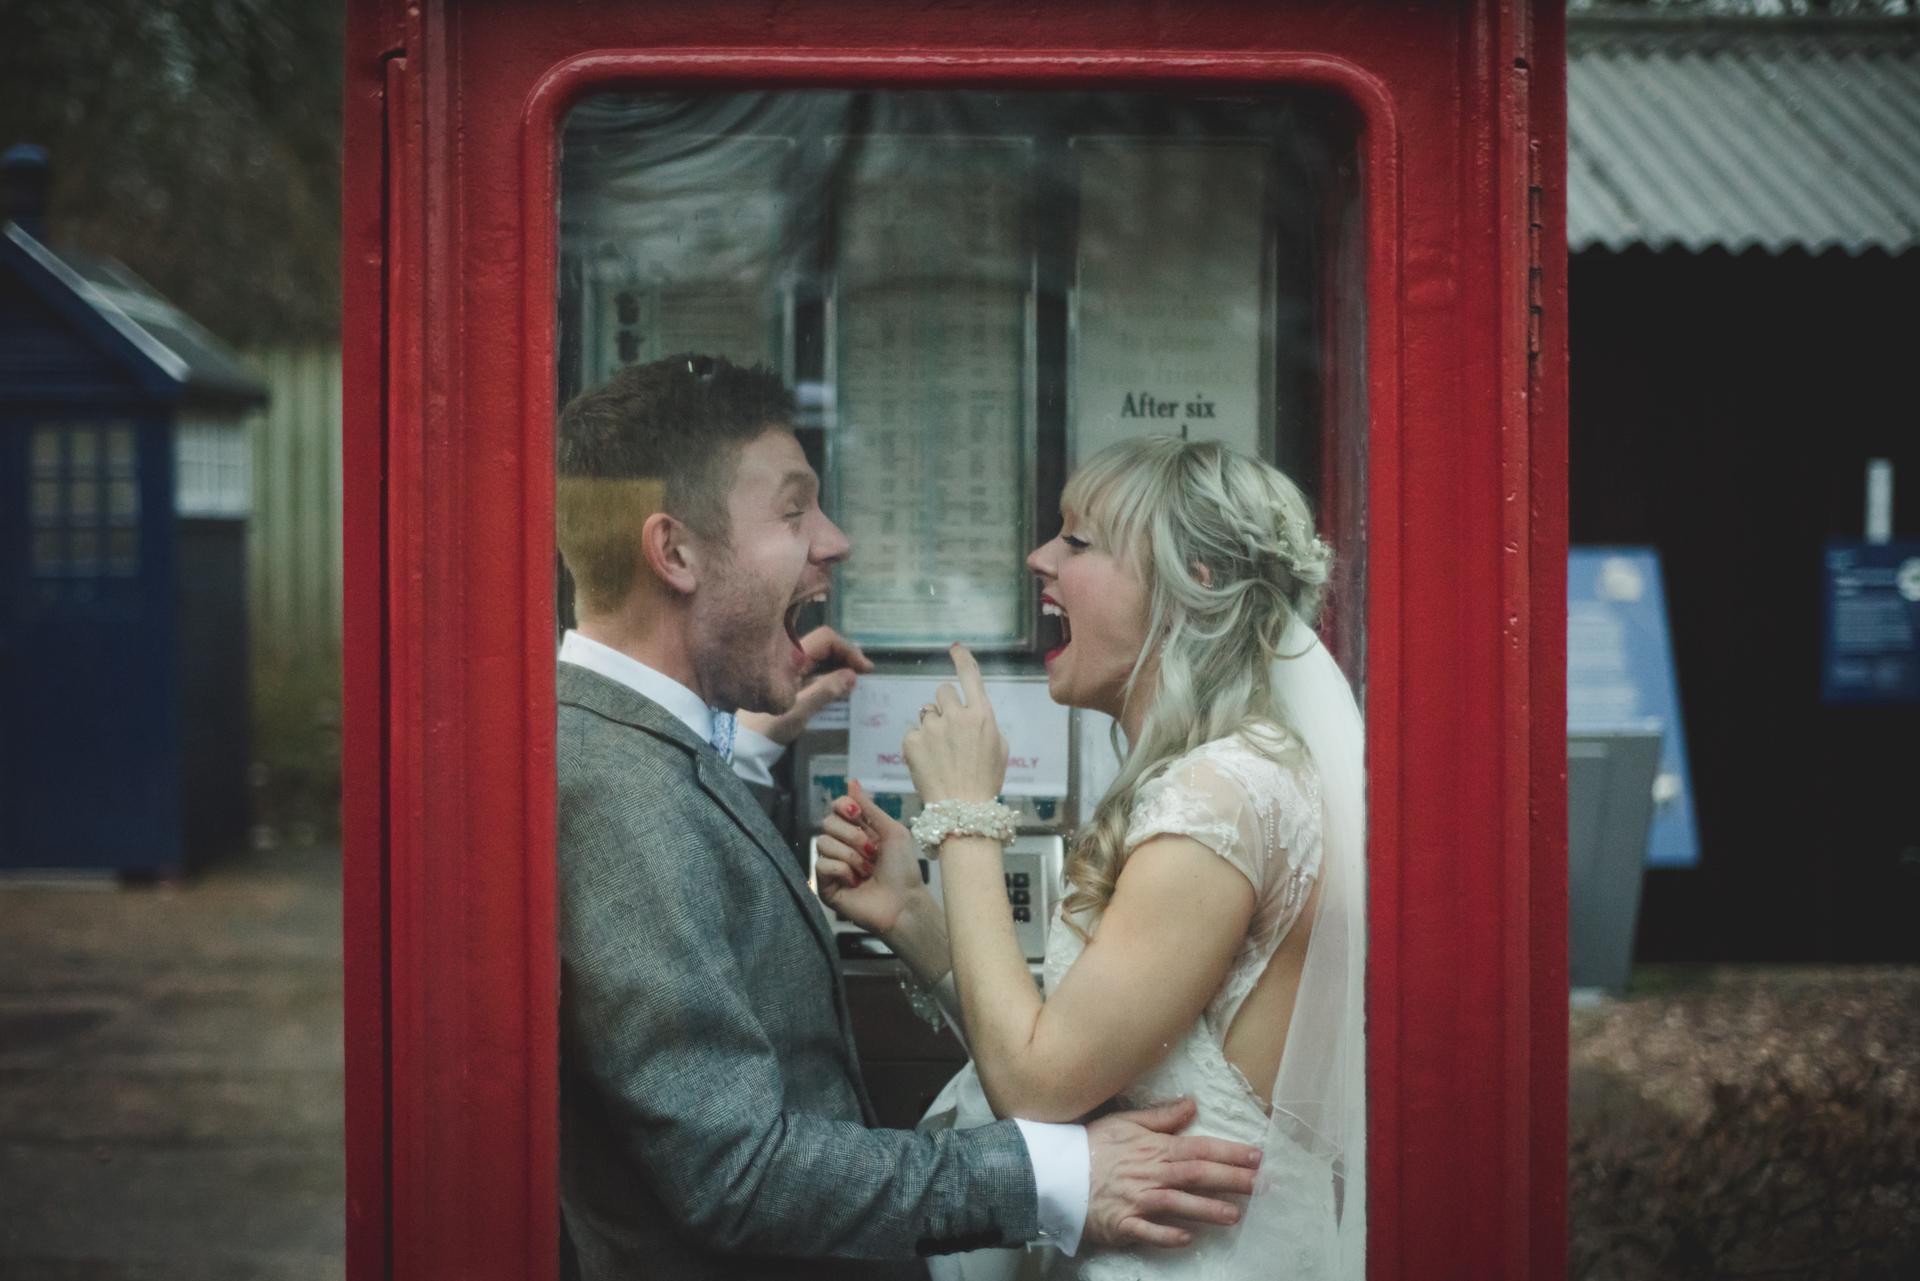 Avoncroft Wedding Fayre – Sunday 8th March 11am – 3pm